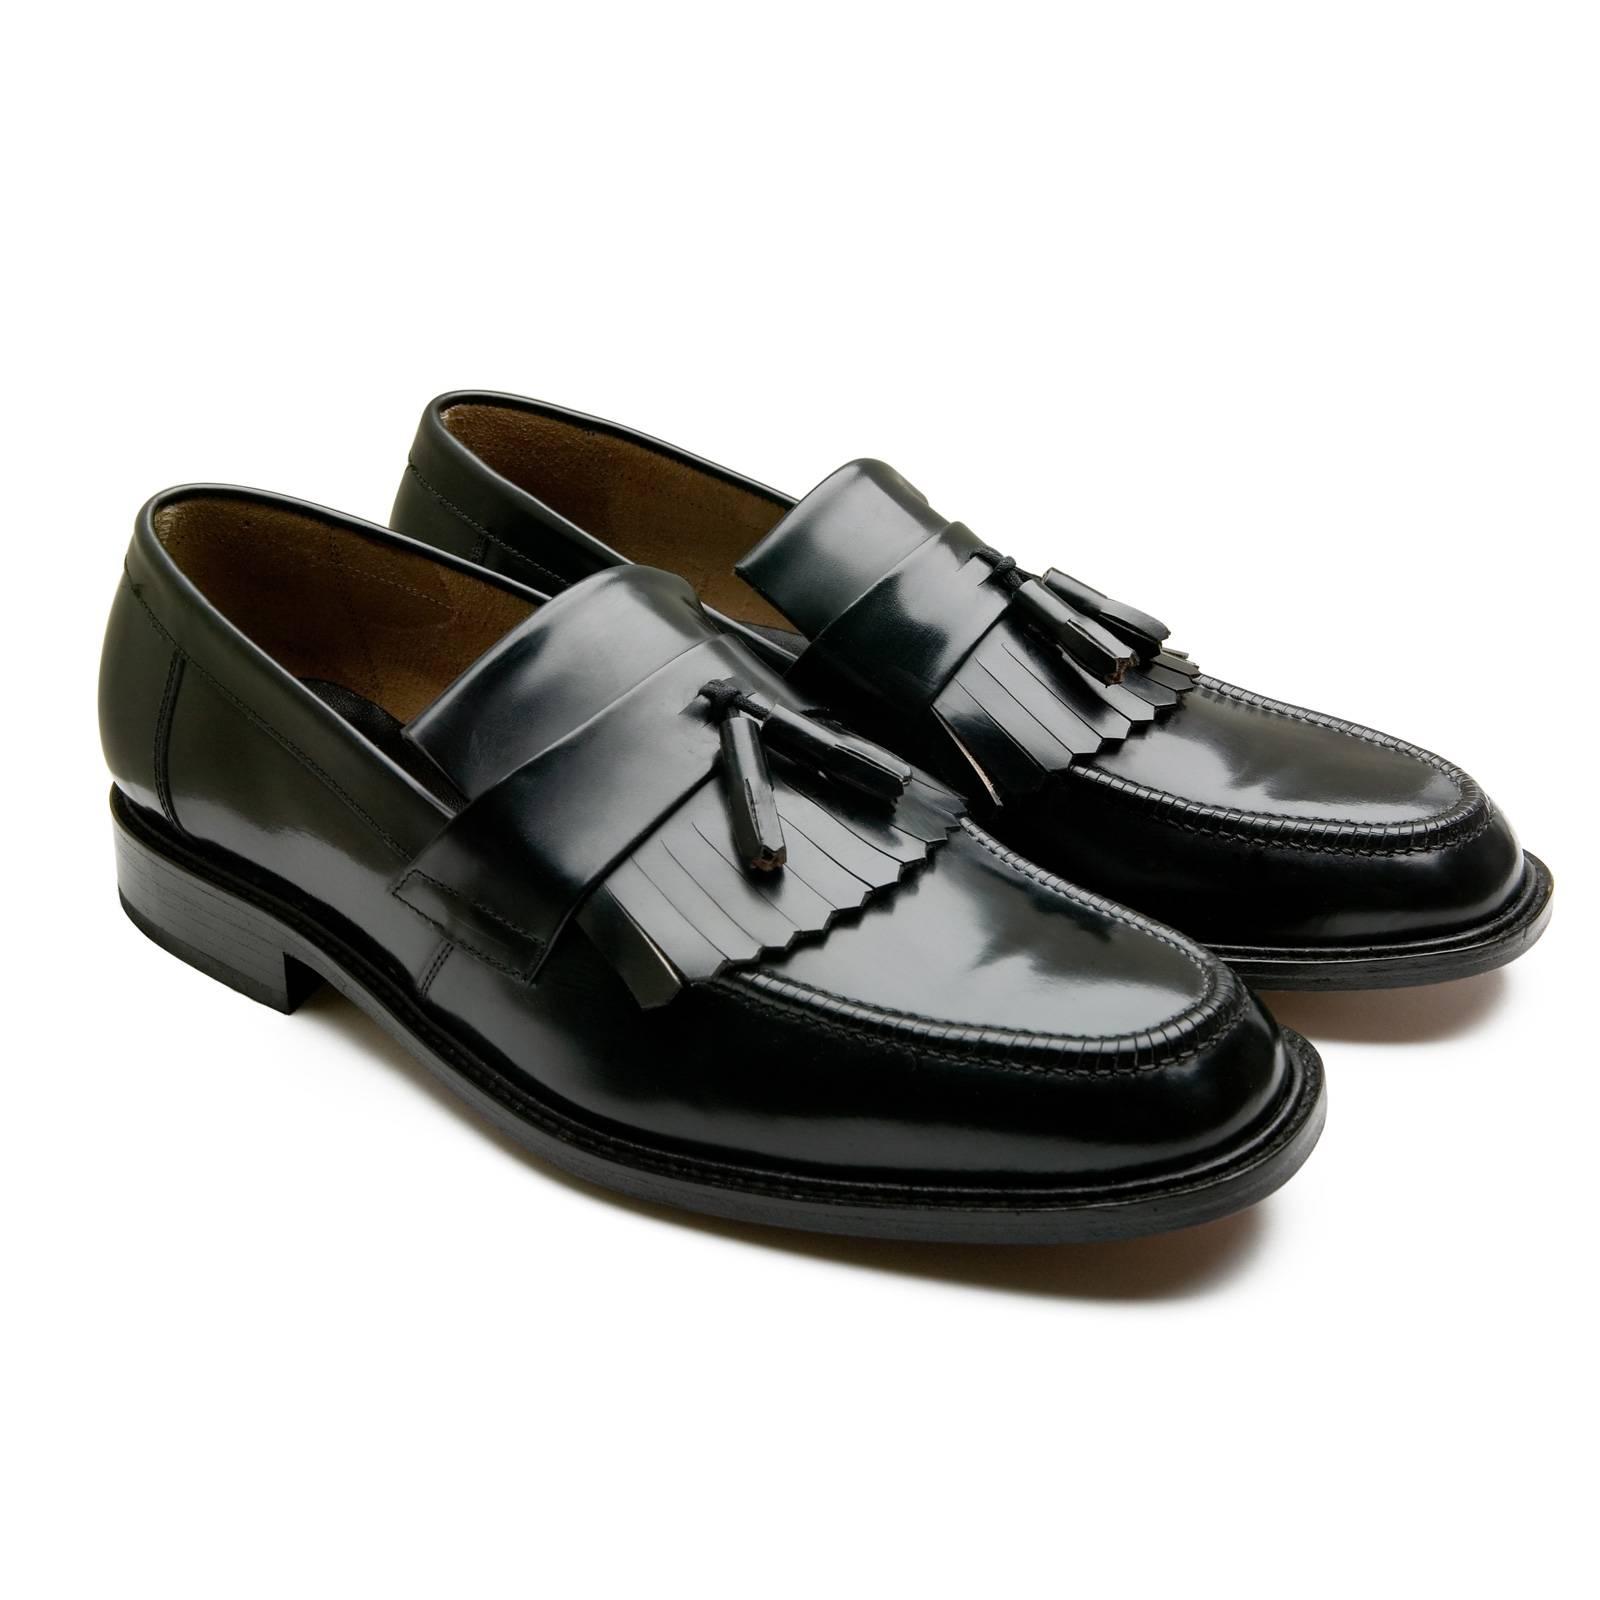 Лоферы Tassle LoafersRude Boy by Merc<br>Произведено в Испании<br><br>Артикул: 910101<br>Материал: 100% кожа<br>Цвет: черный<br>Пол: Мужской